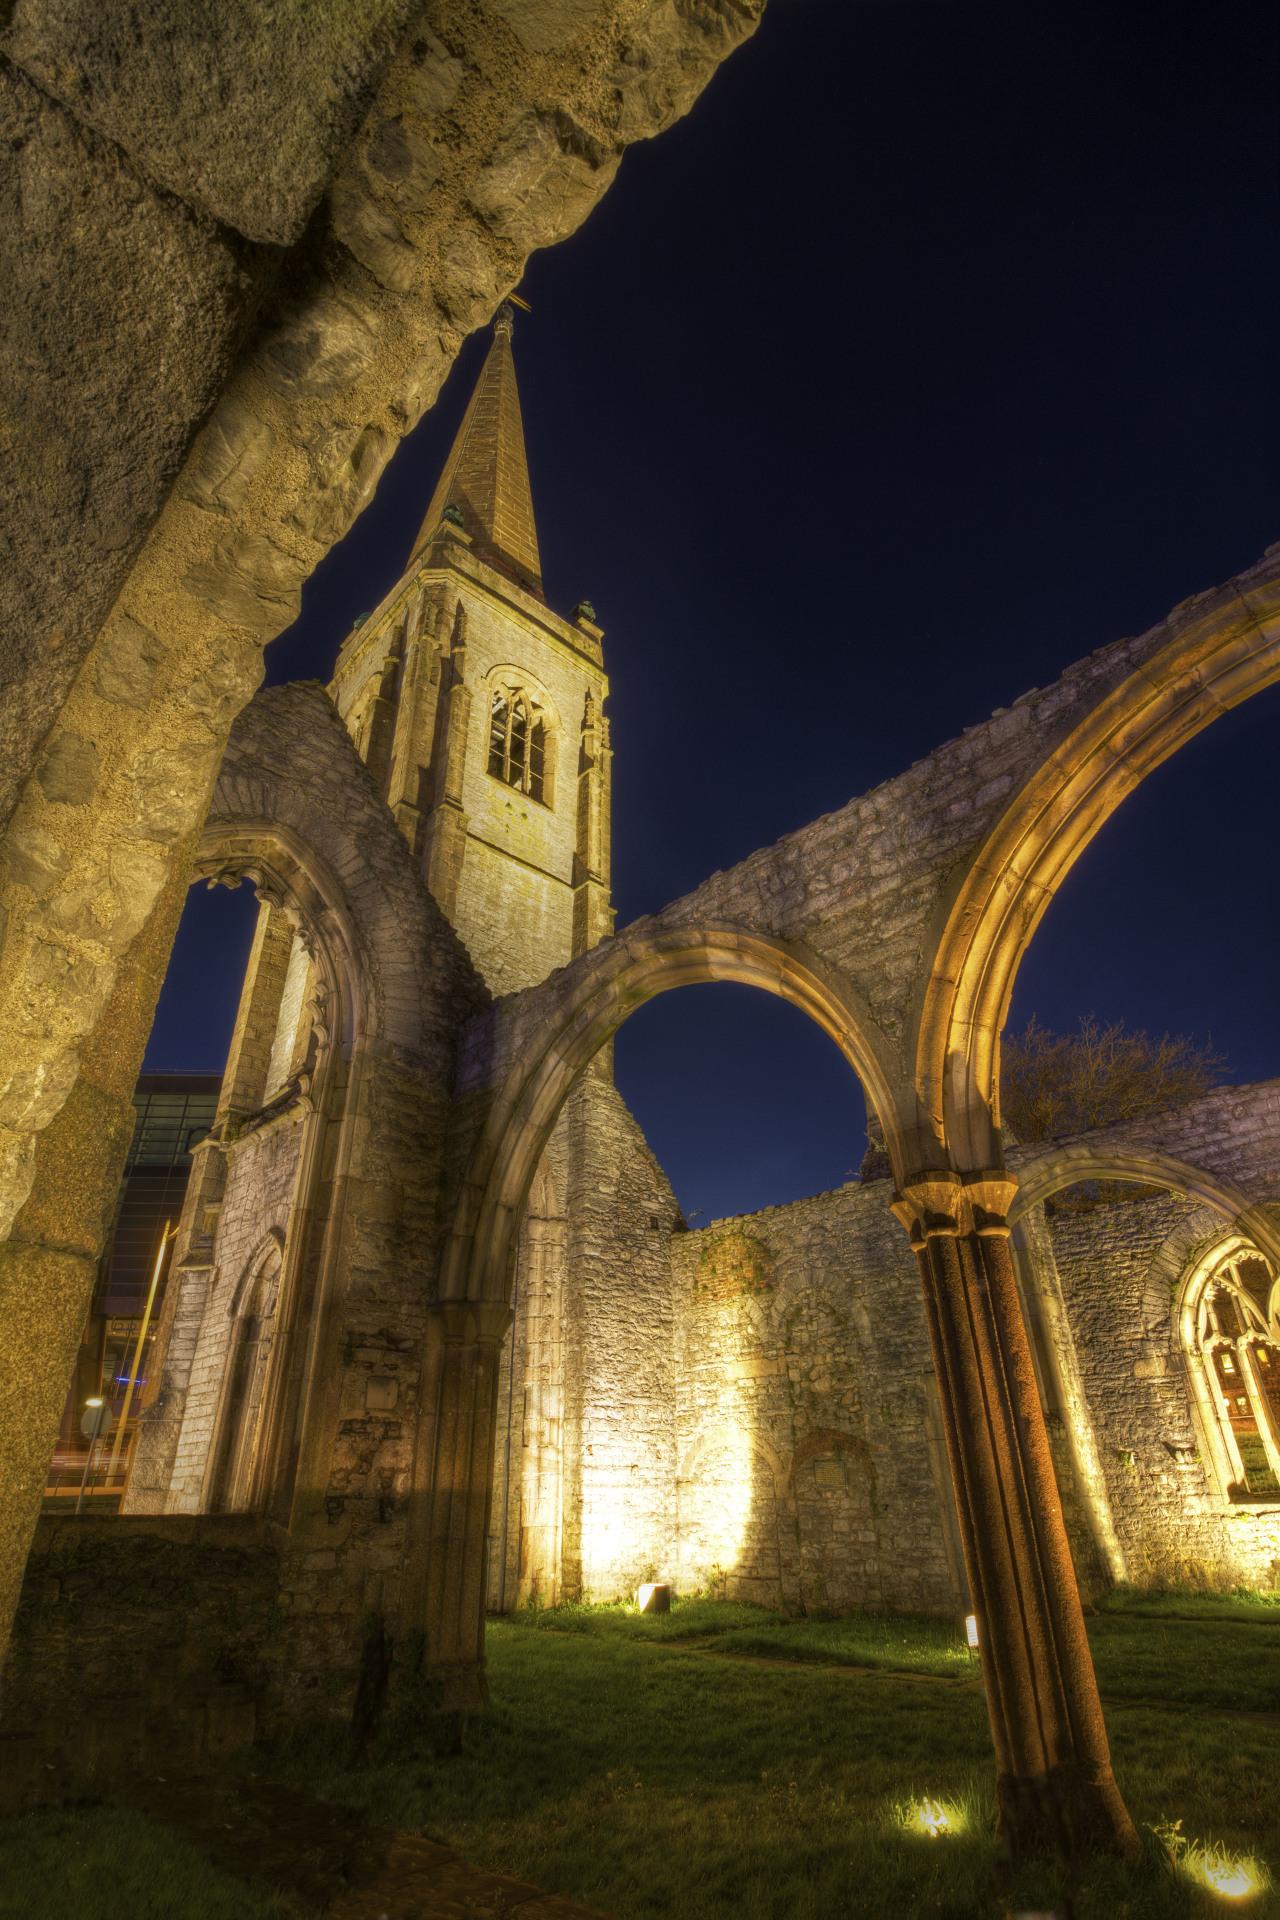 Charles Cross church, Plymouth, Devon. N110